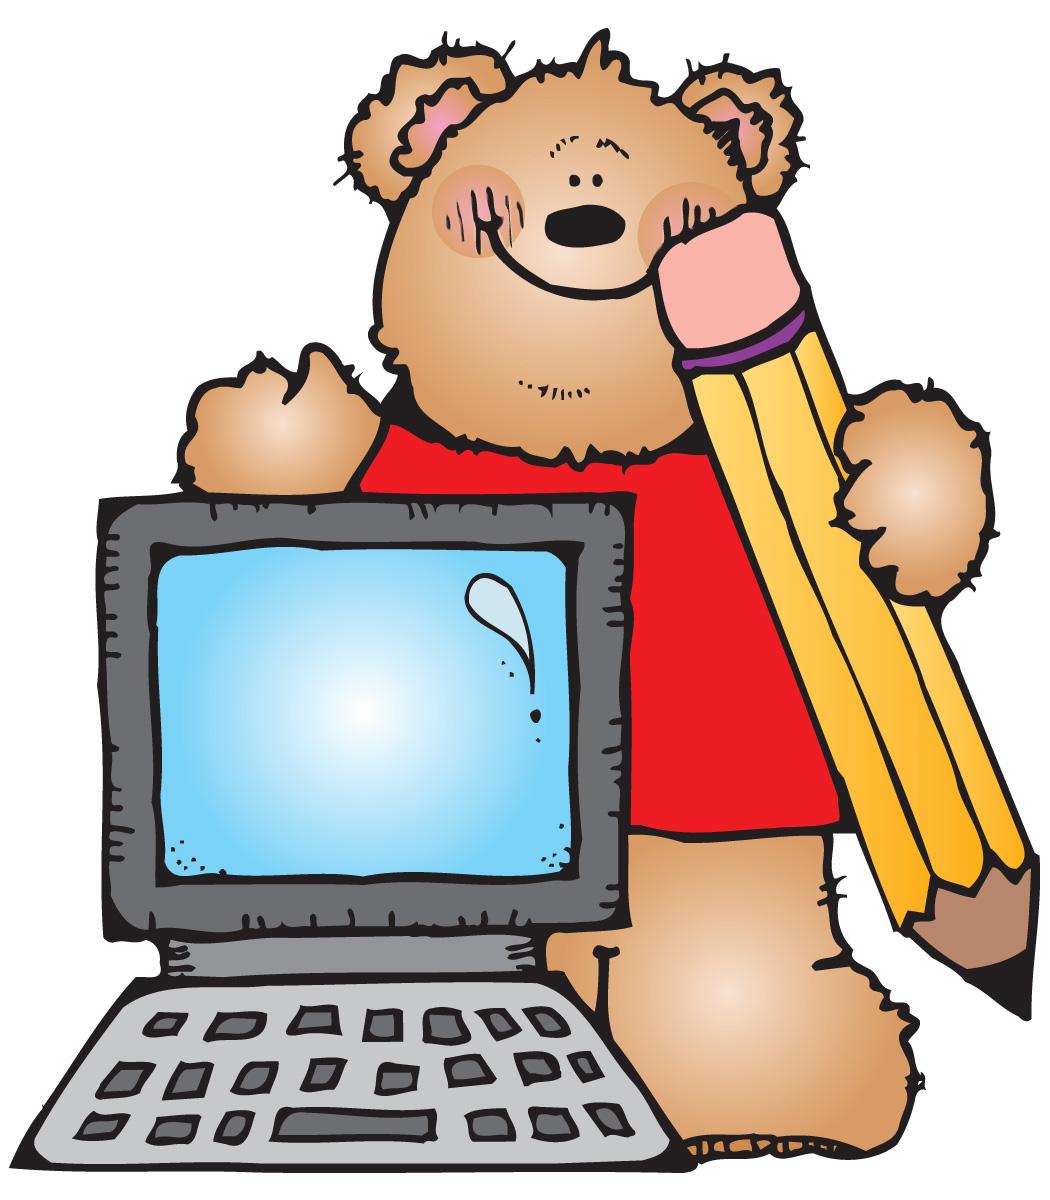 Dj Inkers Bear dj inkers bear clipart - clipart kid